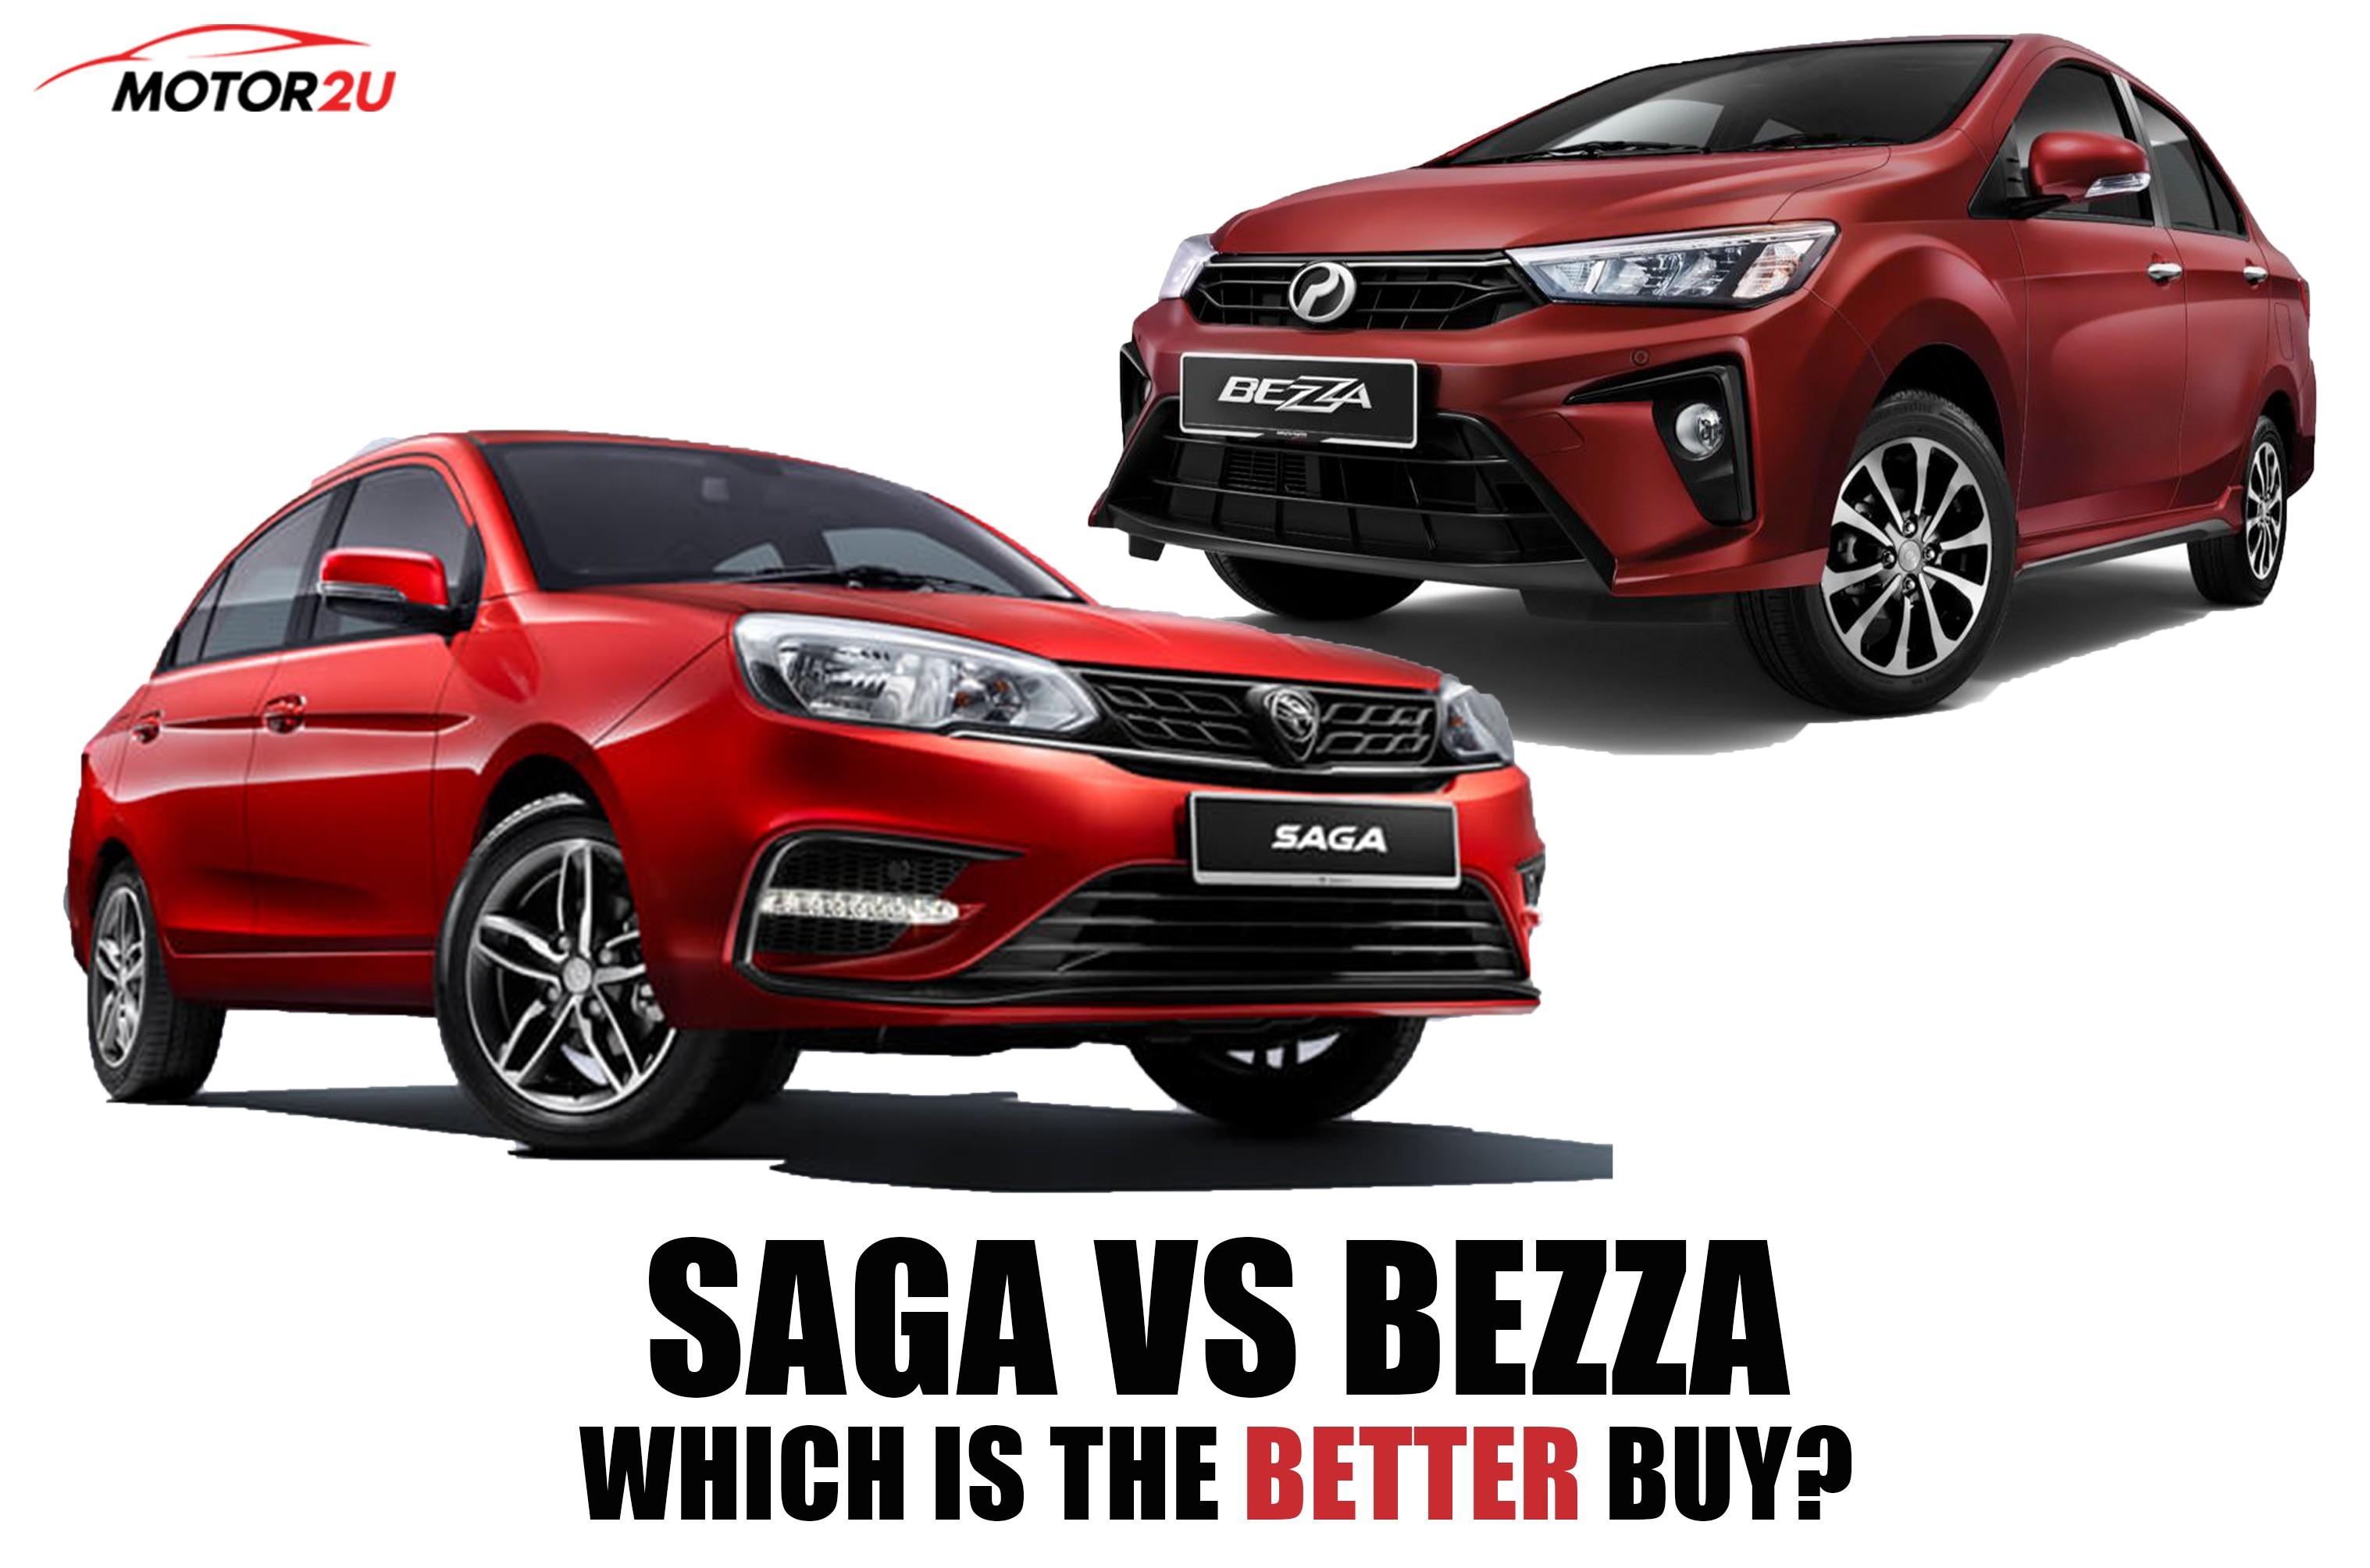 Proton Saga vs Perodua Bezza, which is the better buy?